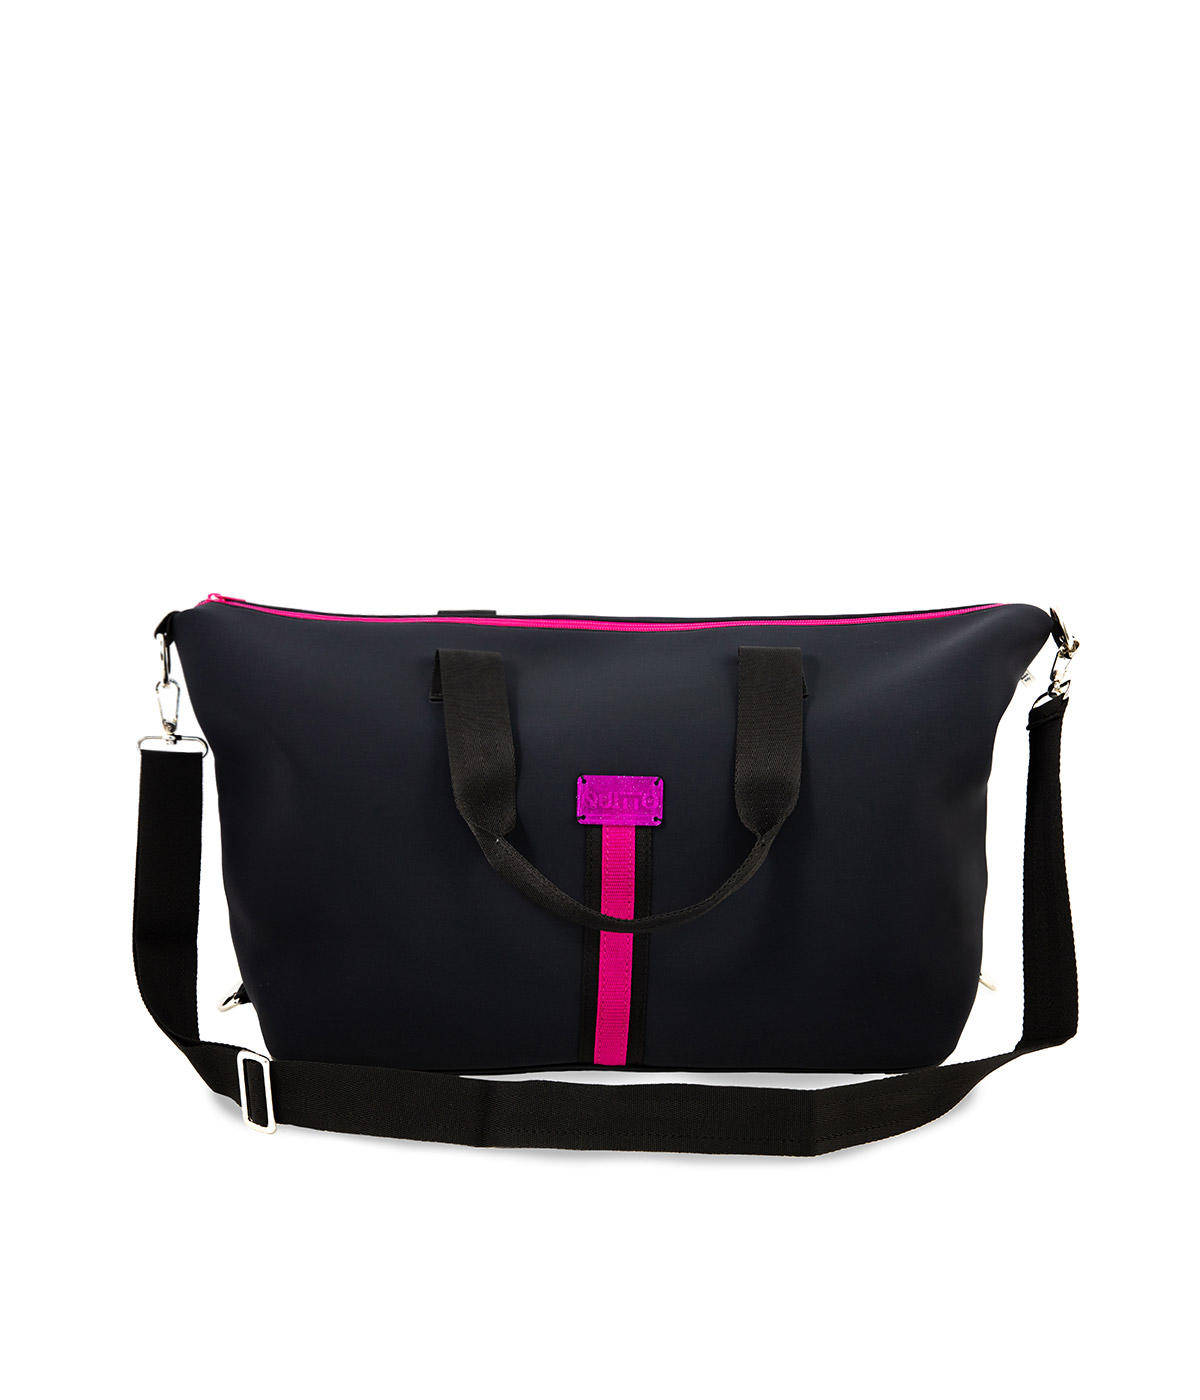 bBorsone Neoprene Impermeabile Quitto Bags